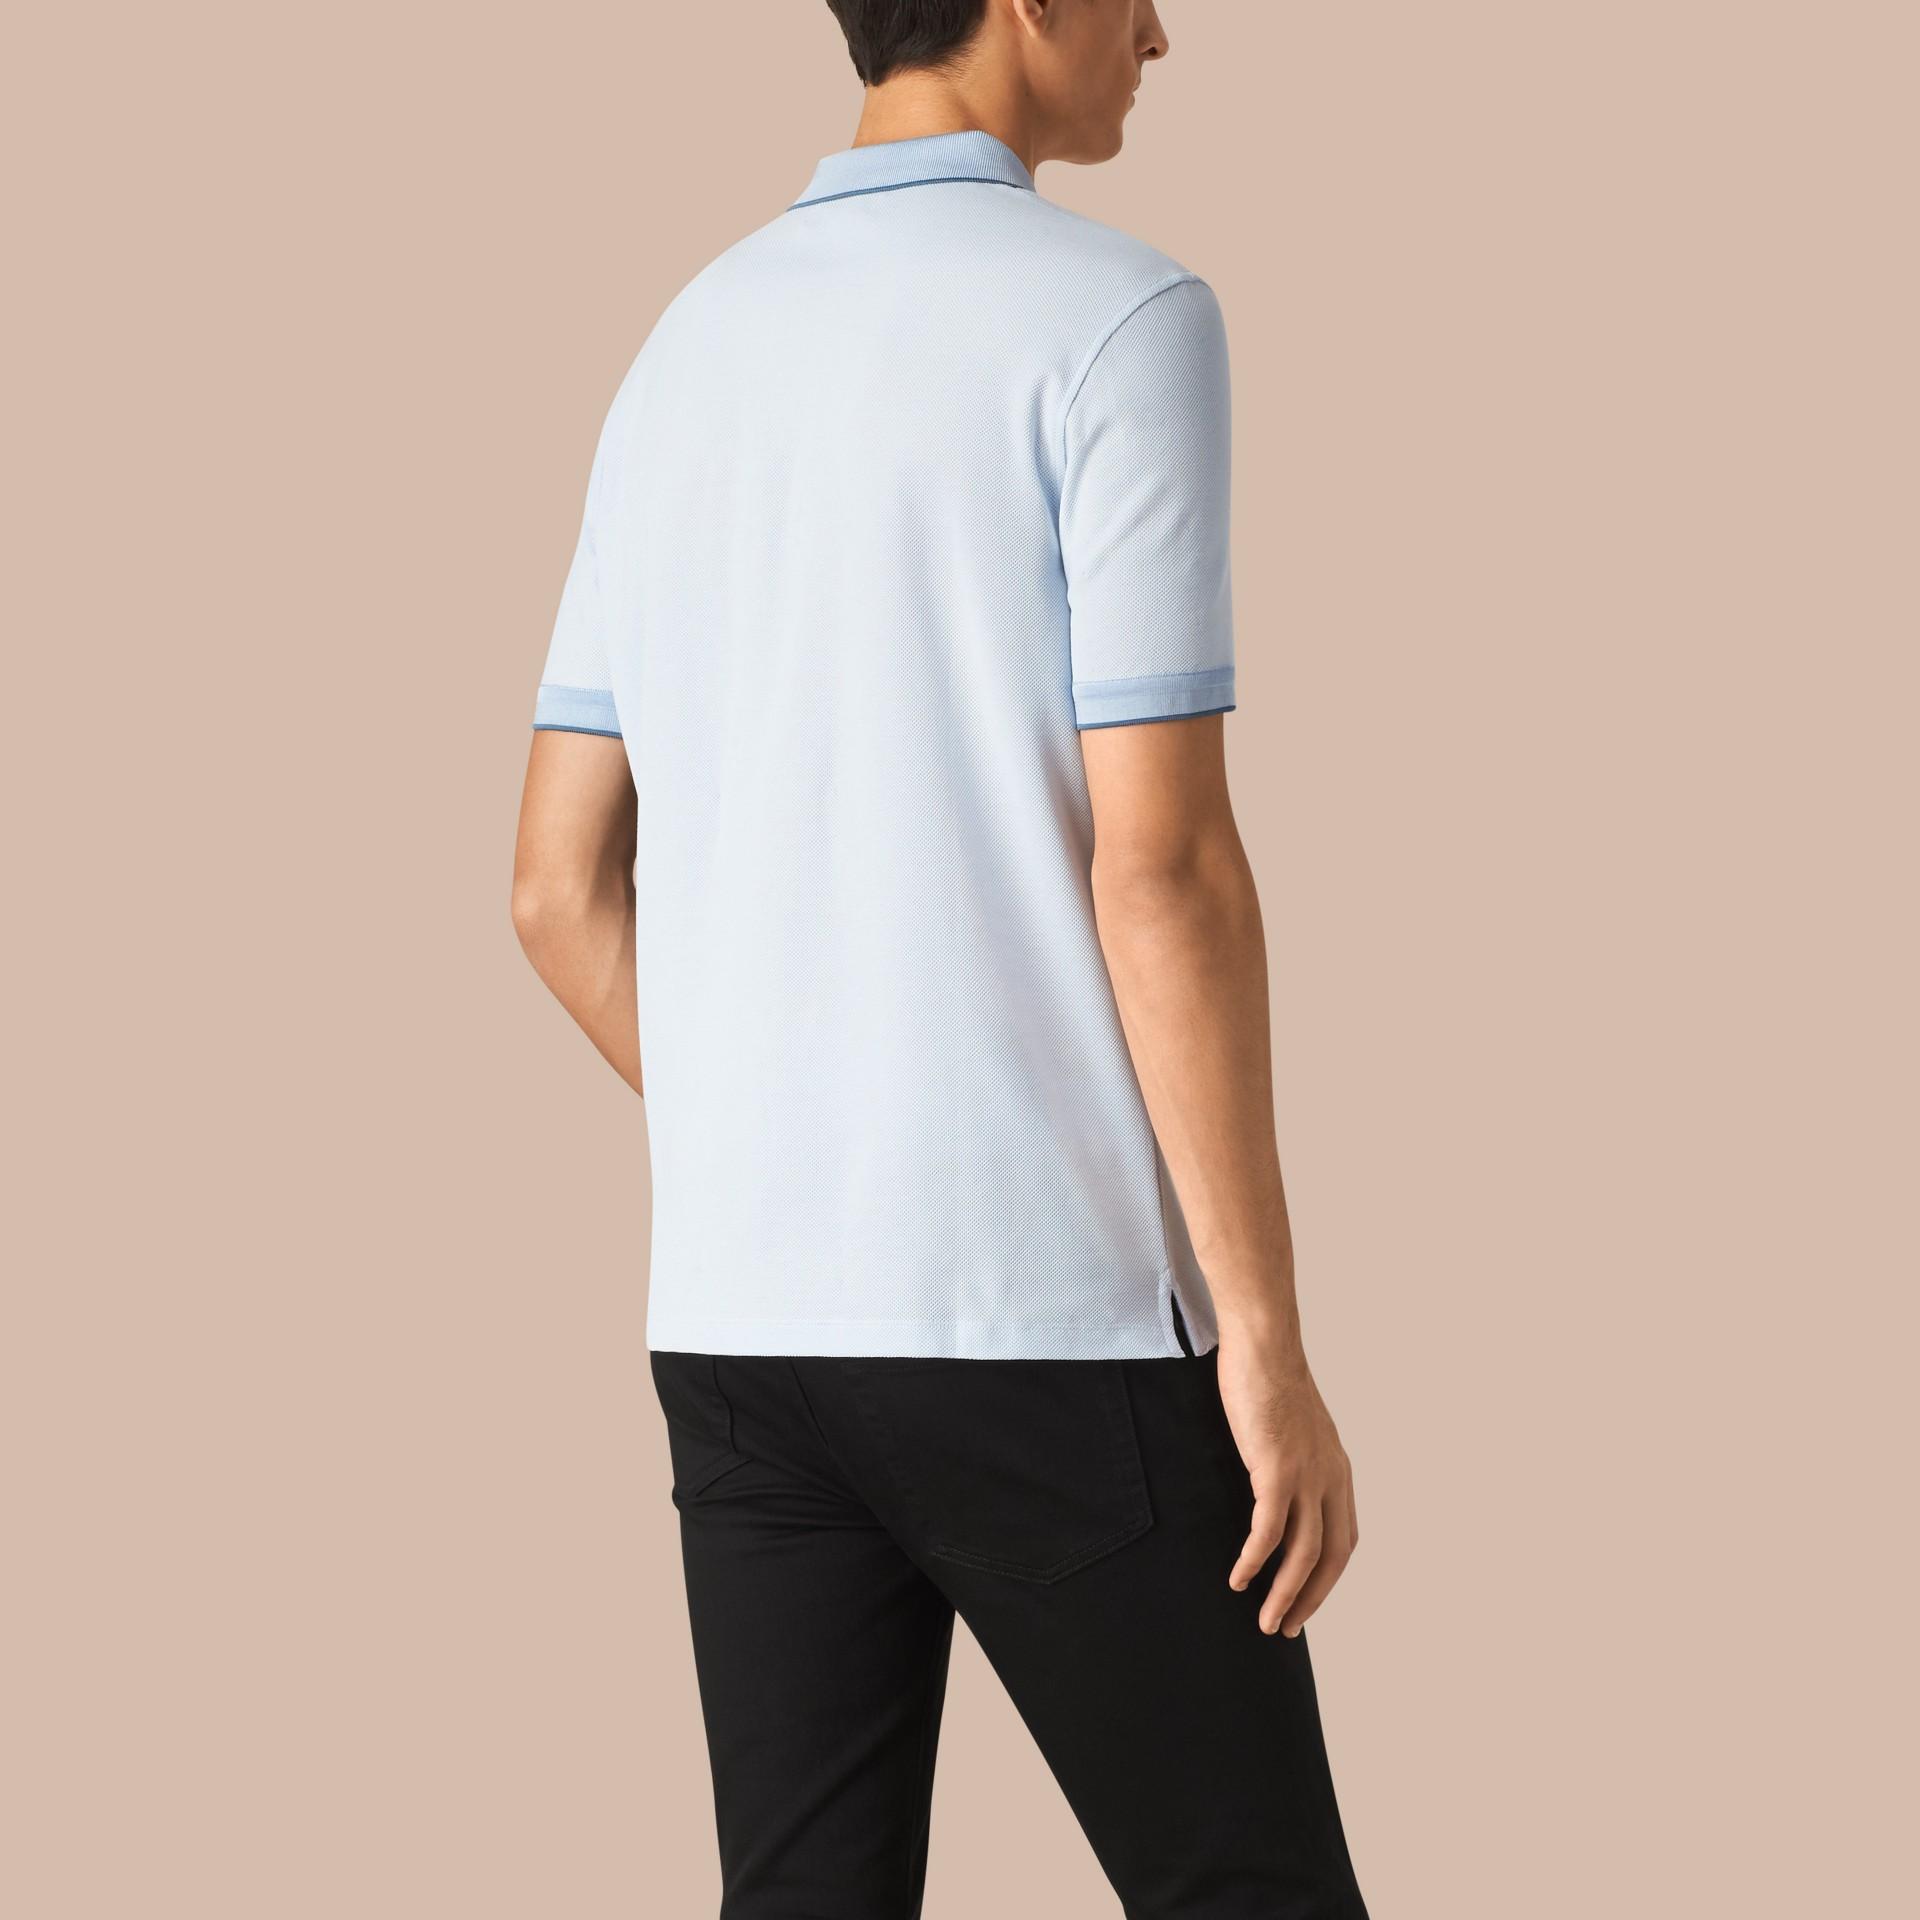 Sky blue/blue azure Contrast Tipping Cotton Piqué Polo Shirt Sky Blue/blue Azure - gallery image 2